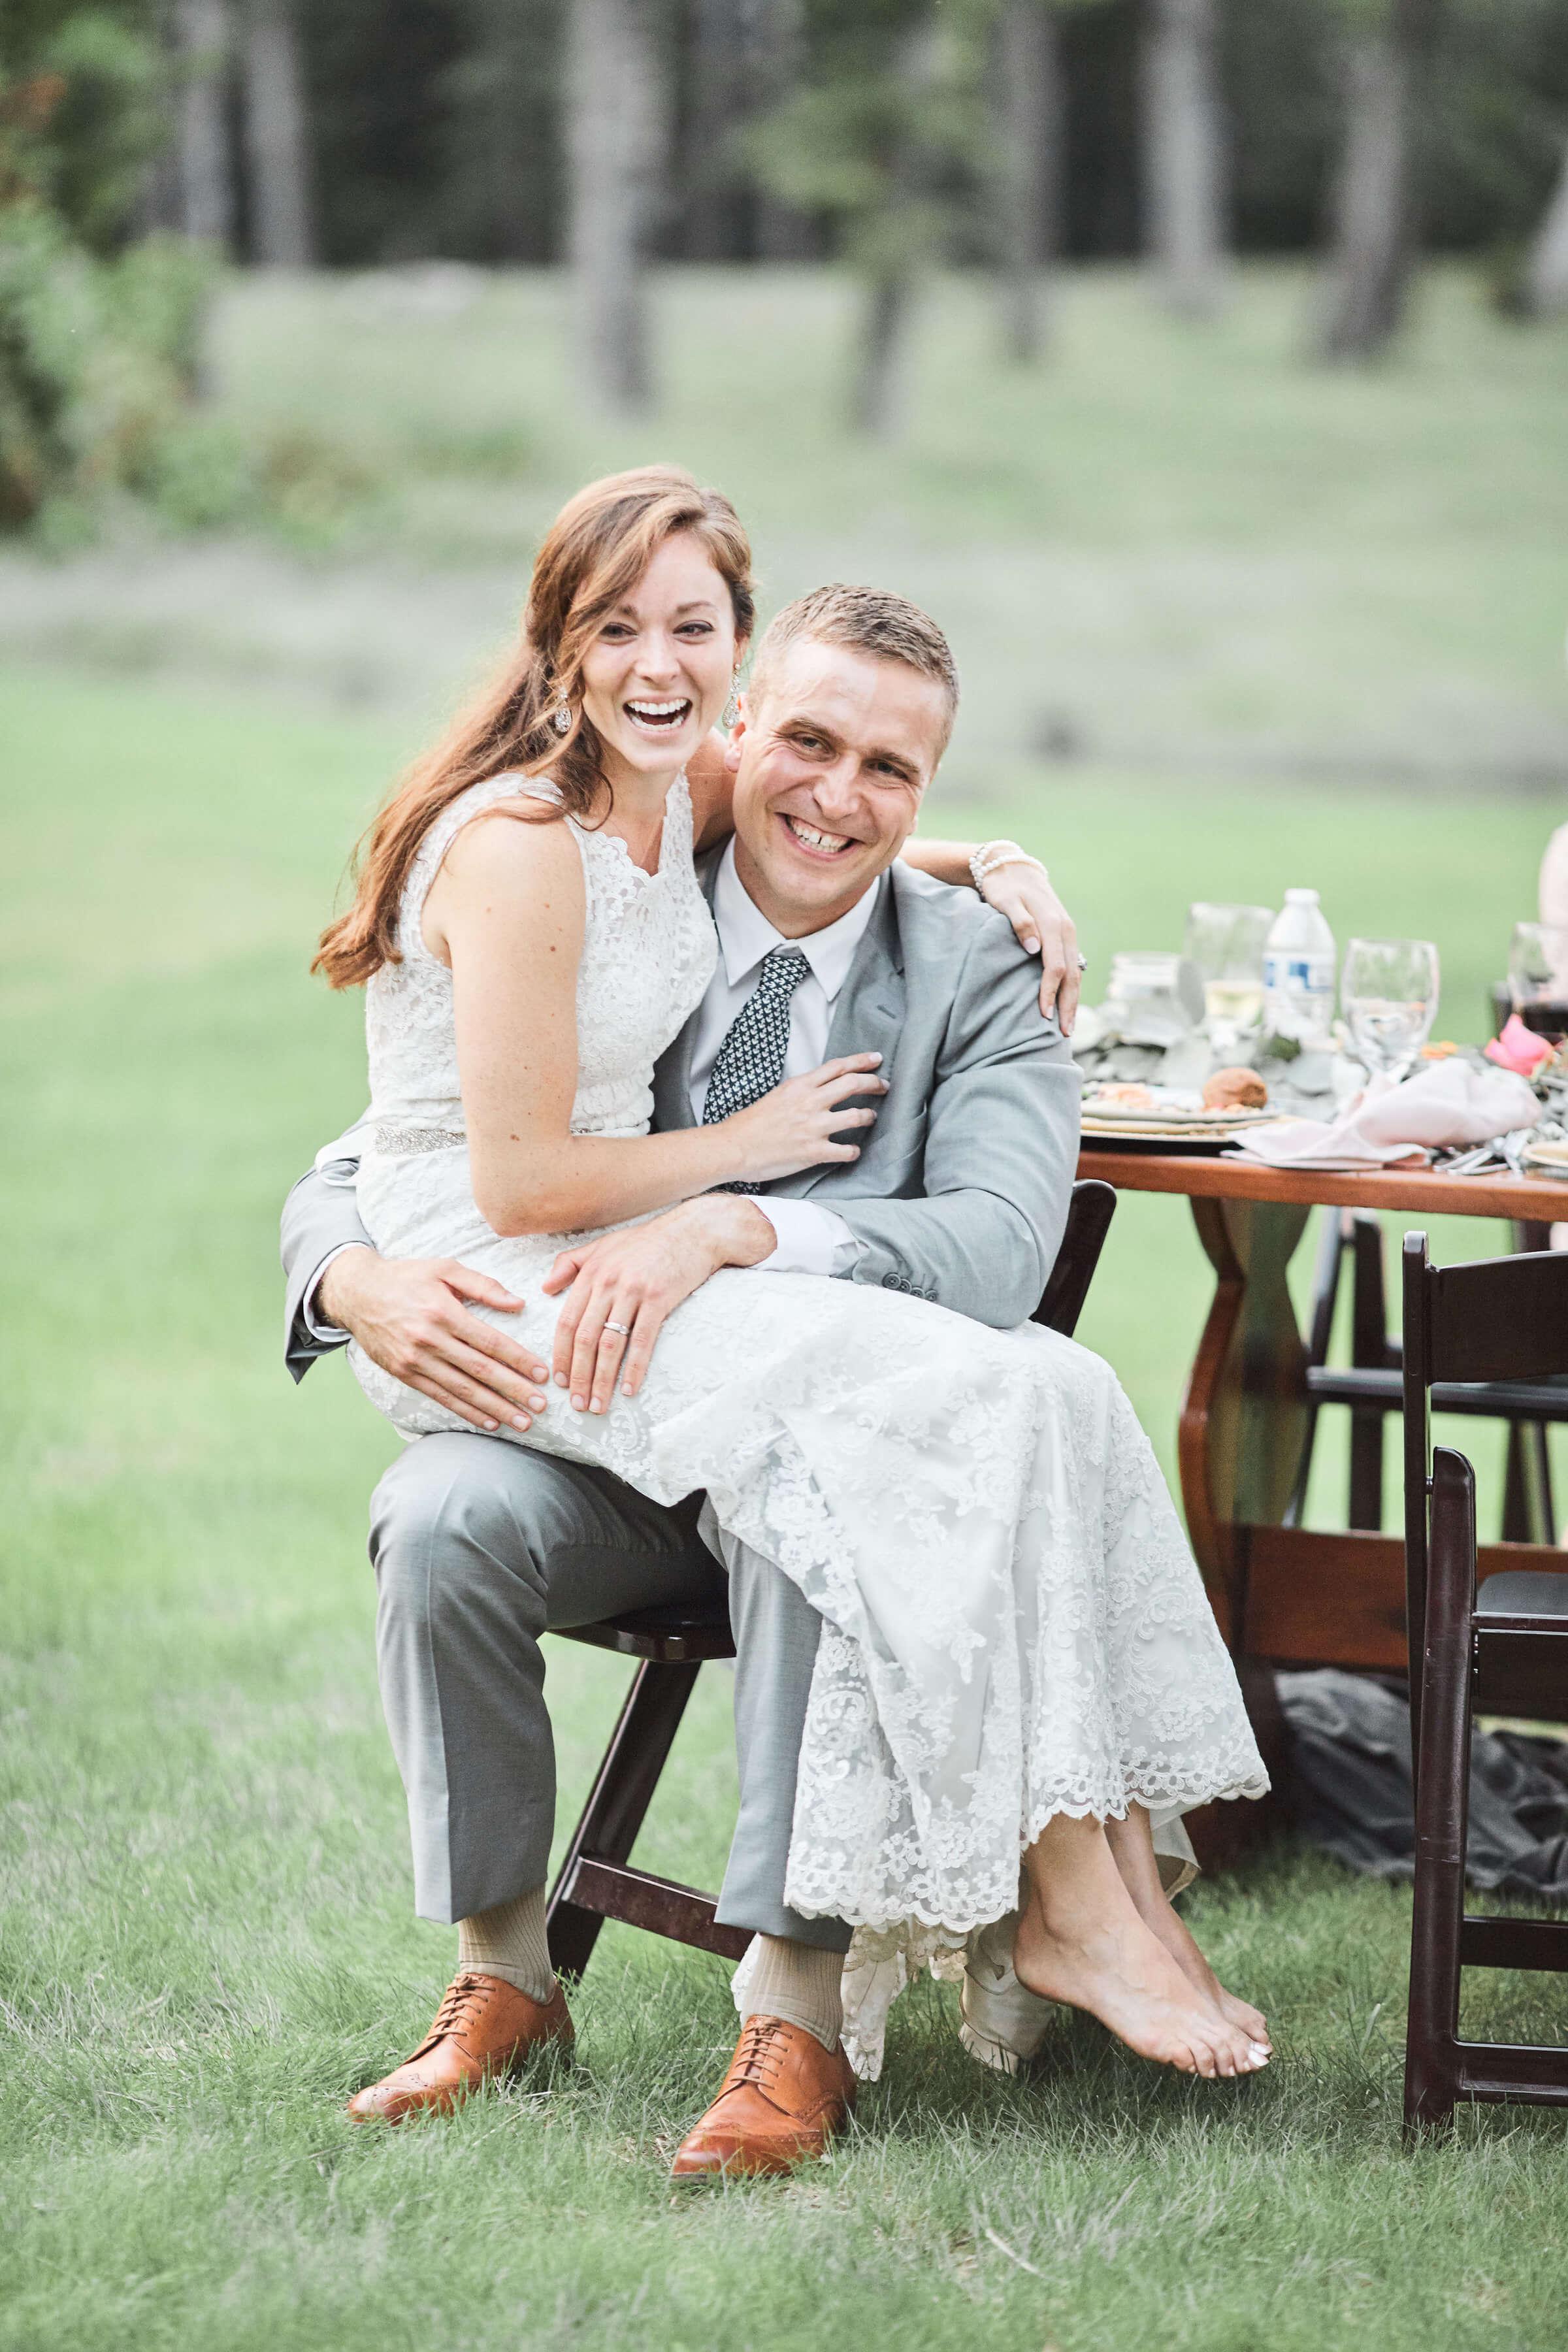 engle-olson-wedding-perry-james-photography-45.jpg